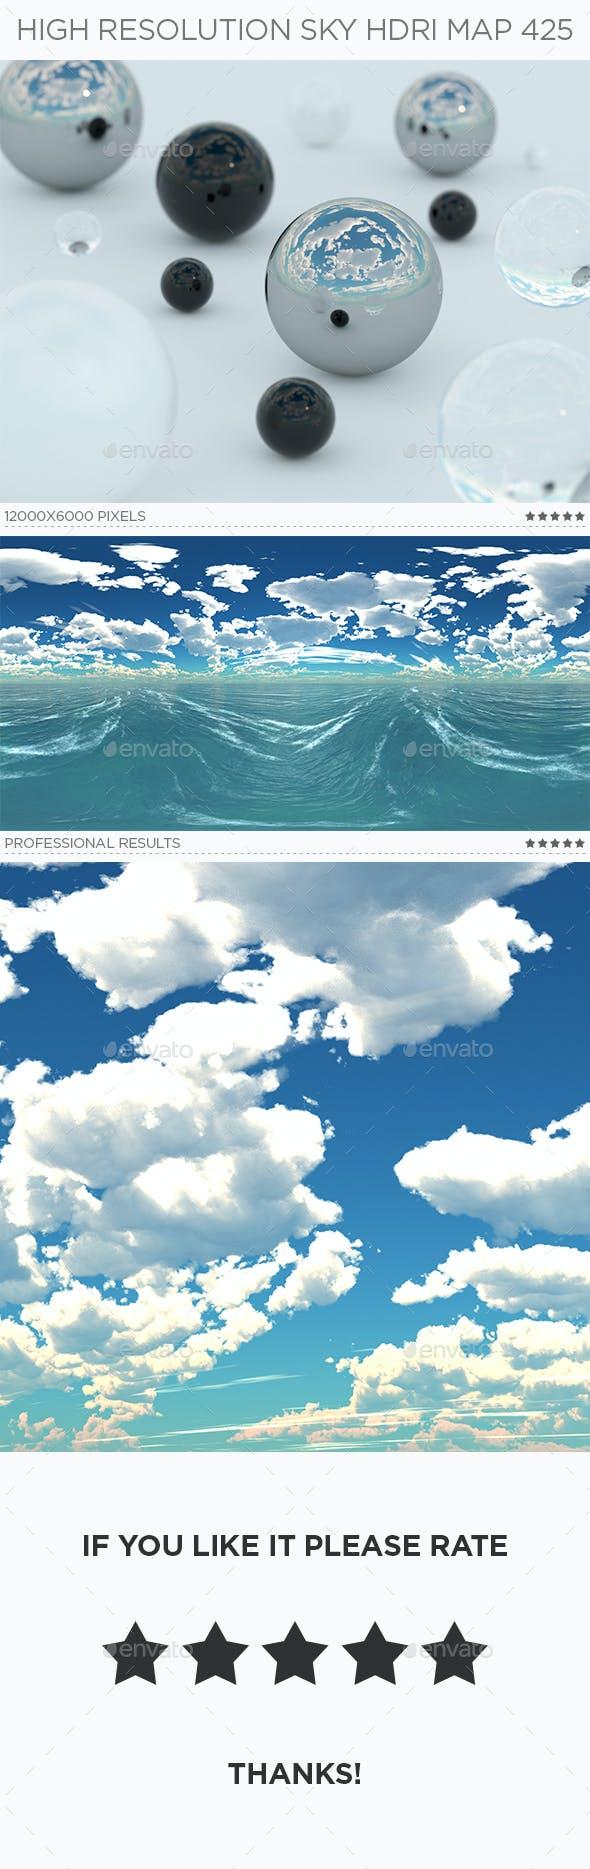 High Resolution Sky HDRi Map 425 - 3DOcean Item for Sale